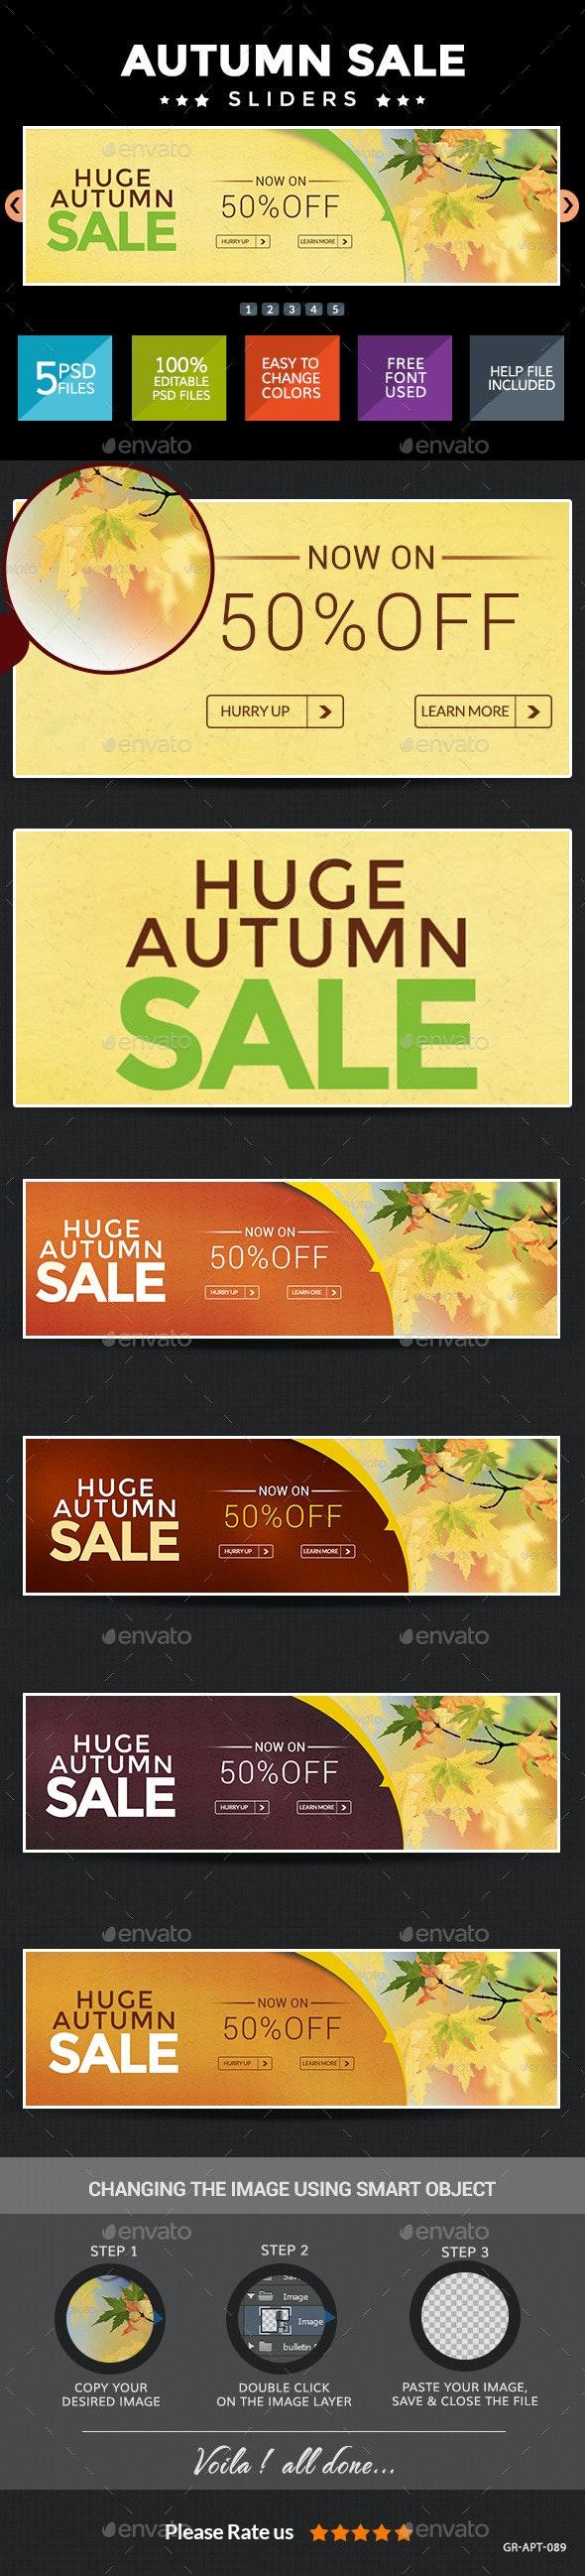 Autumn Sale Sliders - Sliders & Features Web Elements